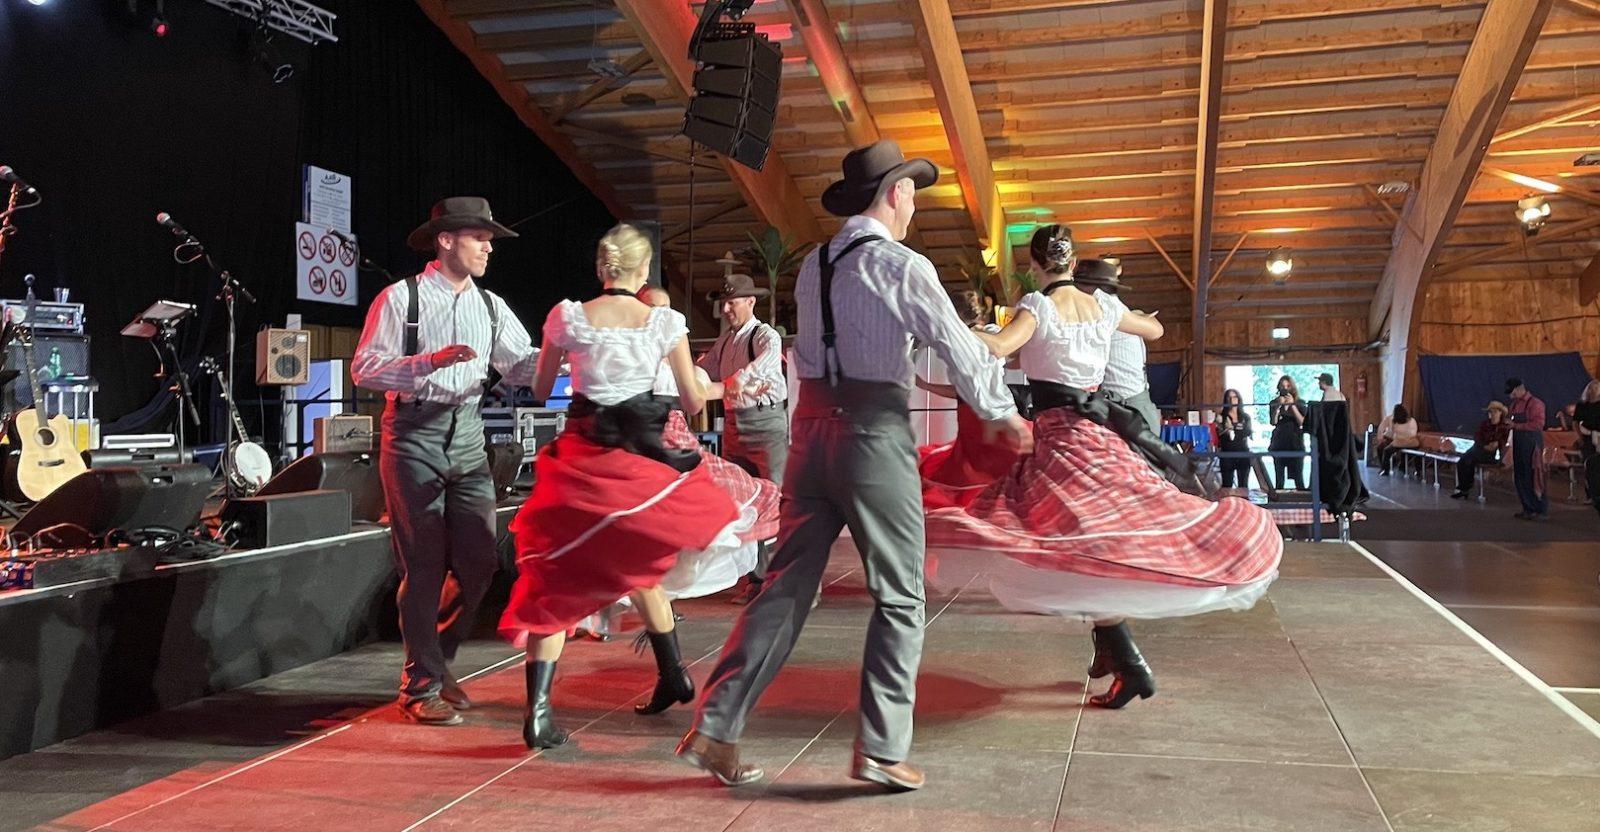 Country Night Gstaad 2021- groupe de danseurs